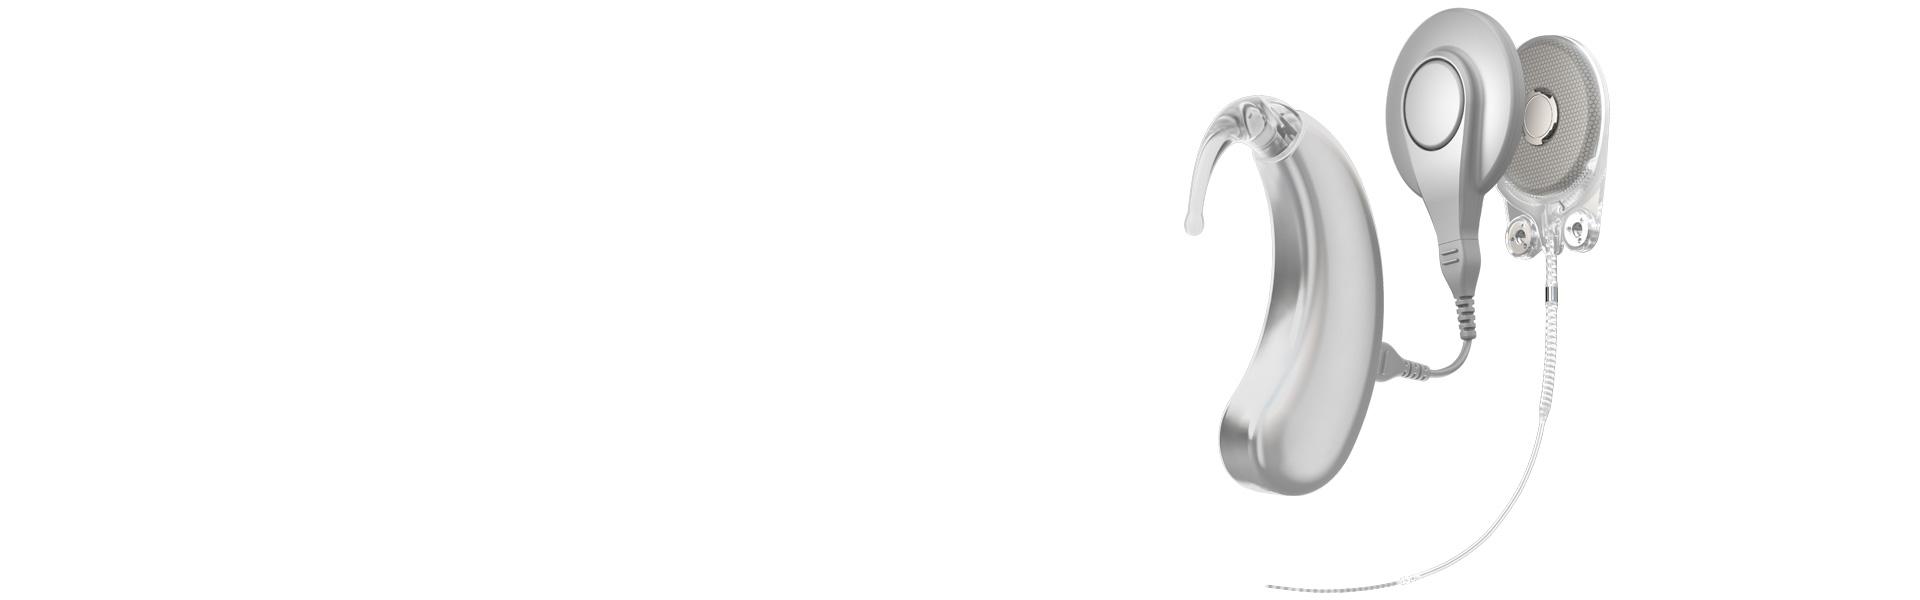 eignung f r eine cochlea implantat l sung. Black Bedroom Furniture Sets. Home Design Ideas